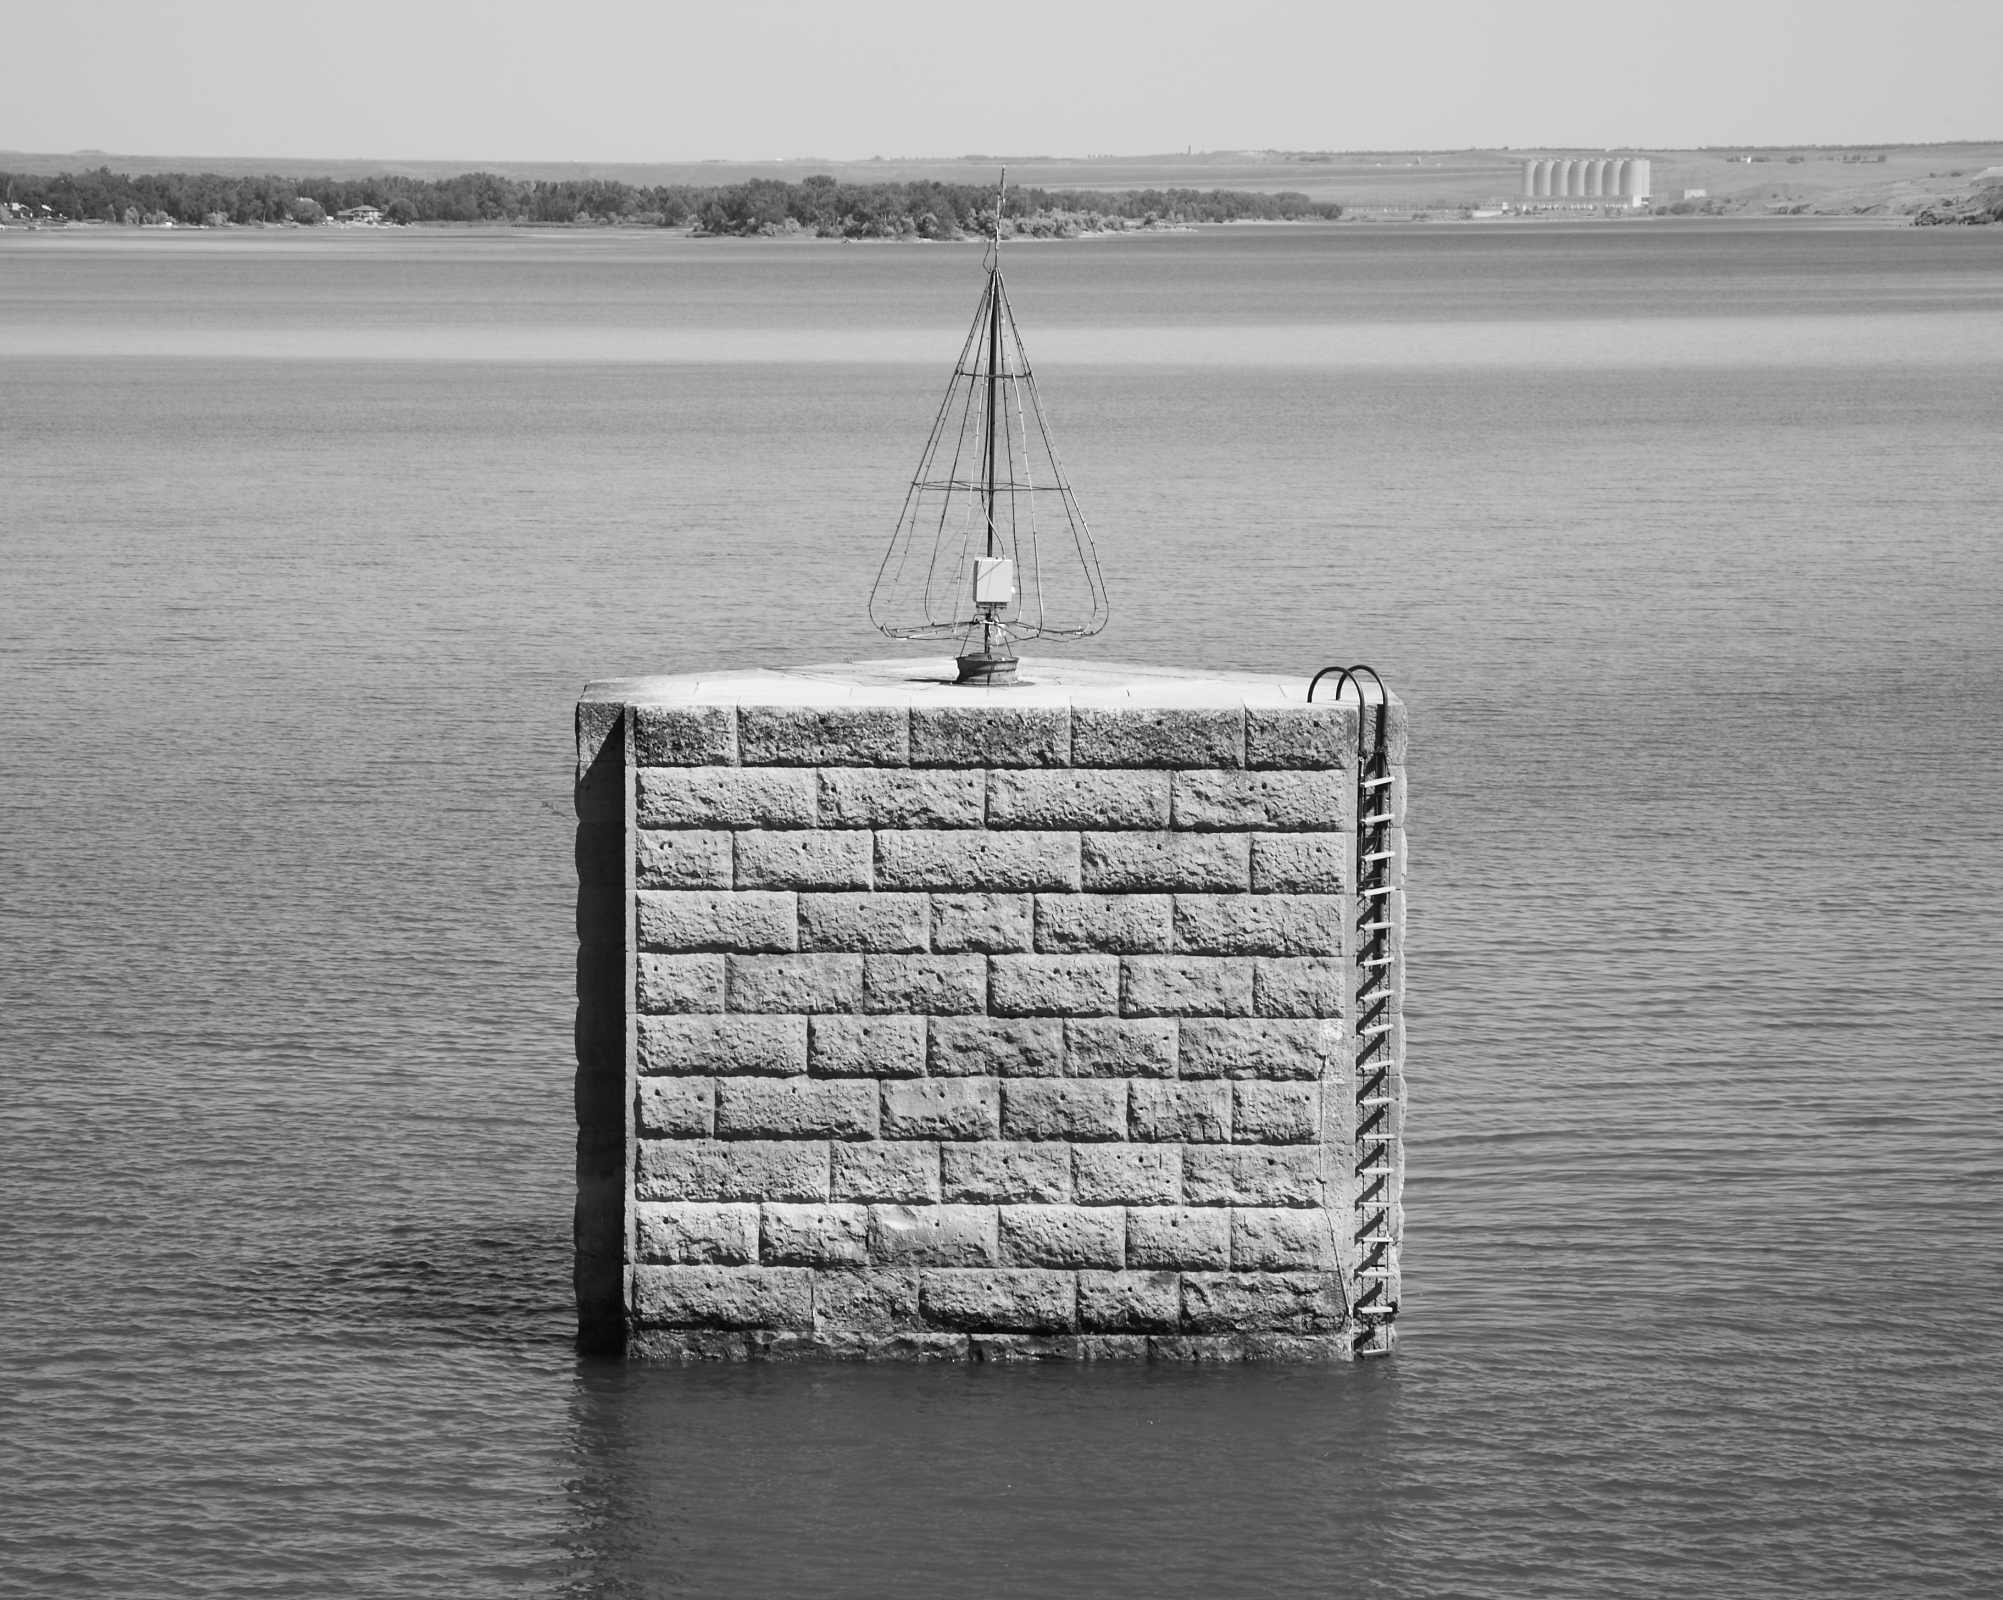 Pierre C&NW Bridge - Upstream Ice/Debris Protection Pier (Please credit Daniel R. Pratt and the Historic American Engineering Record)